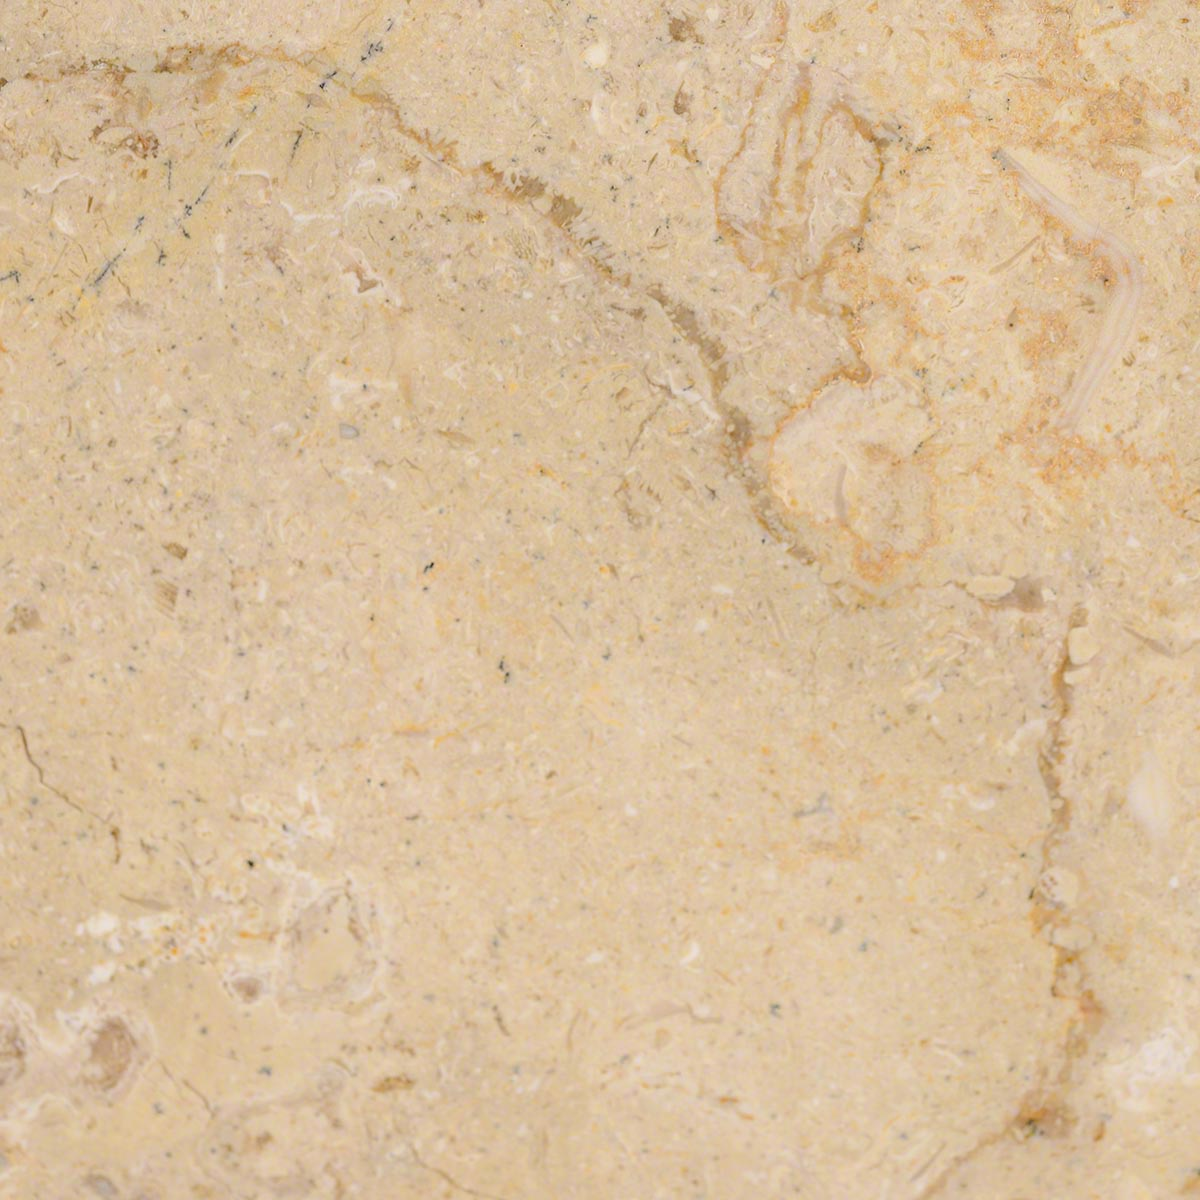 Sahara Gold Marble Countertops, Marble Slabs, Marble Tile